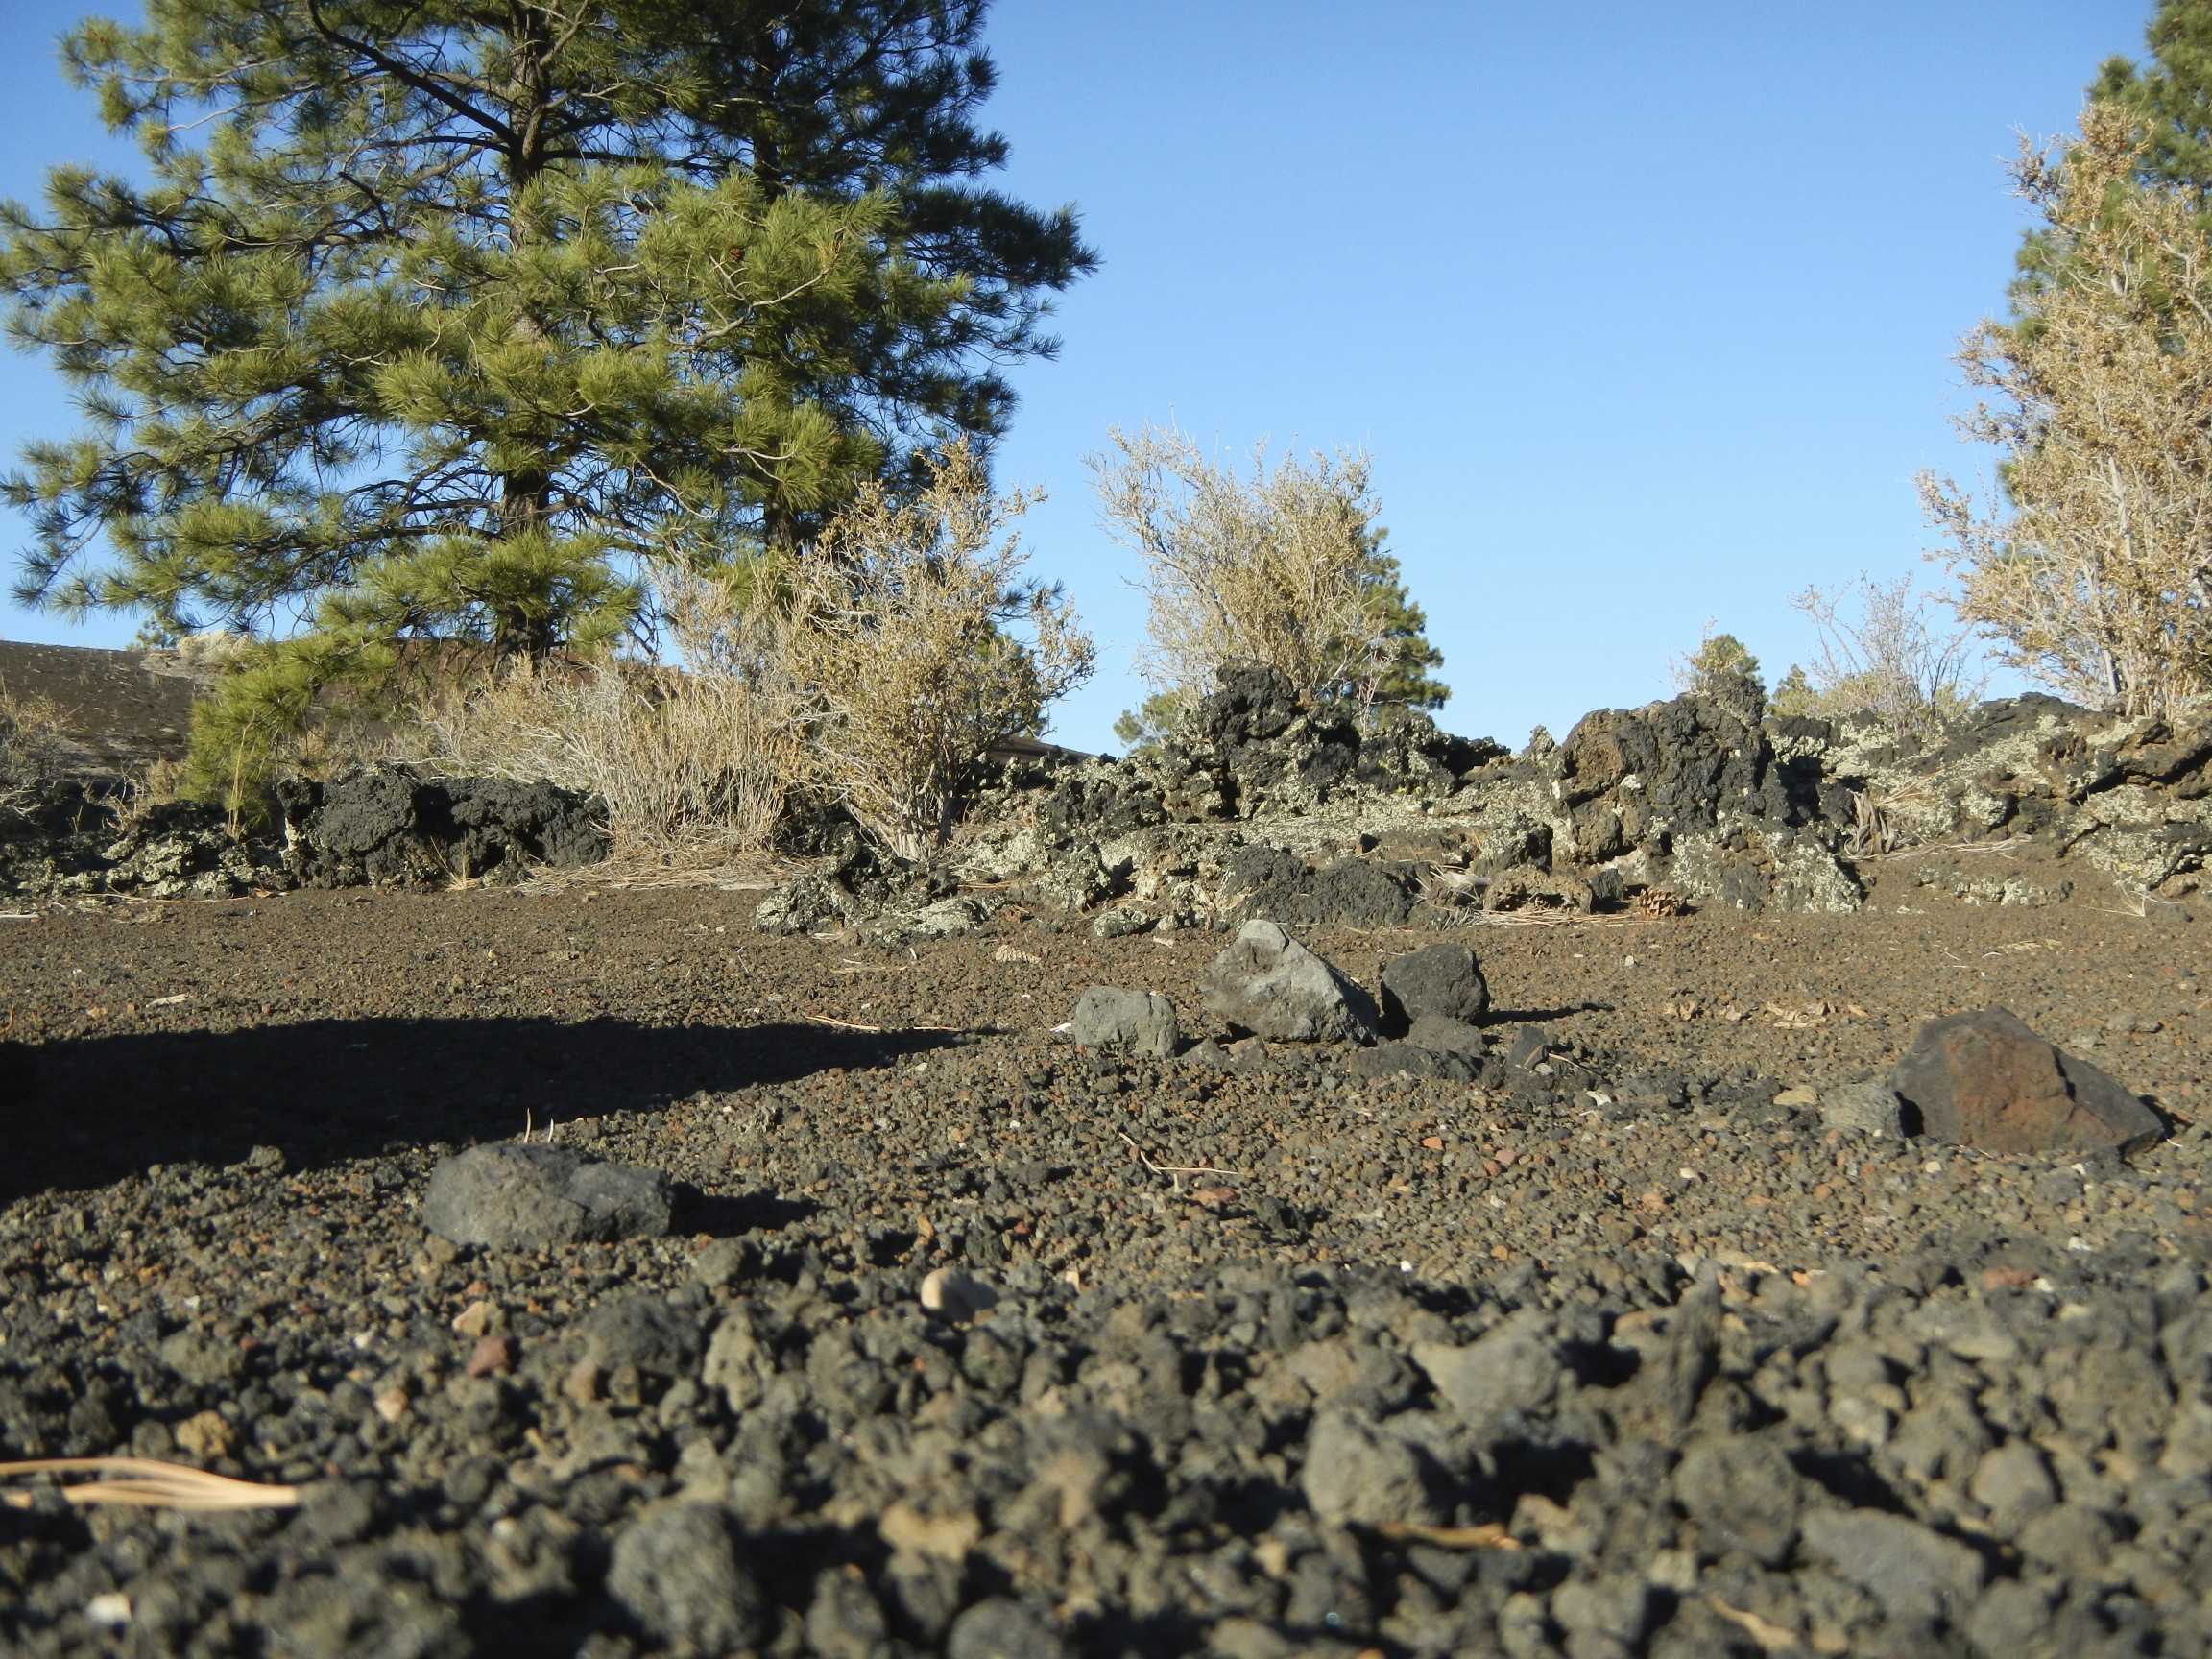 The lava rocks up close